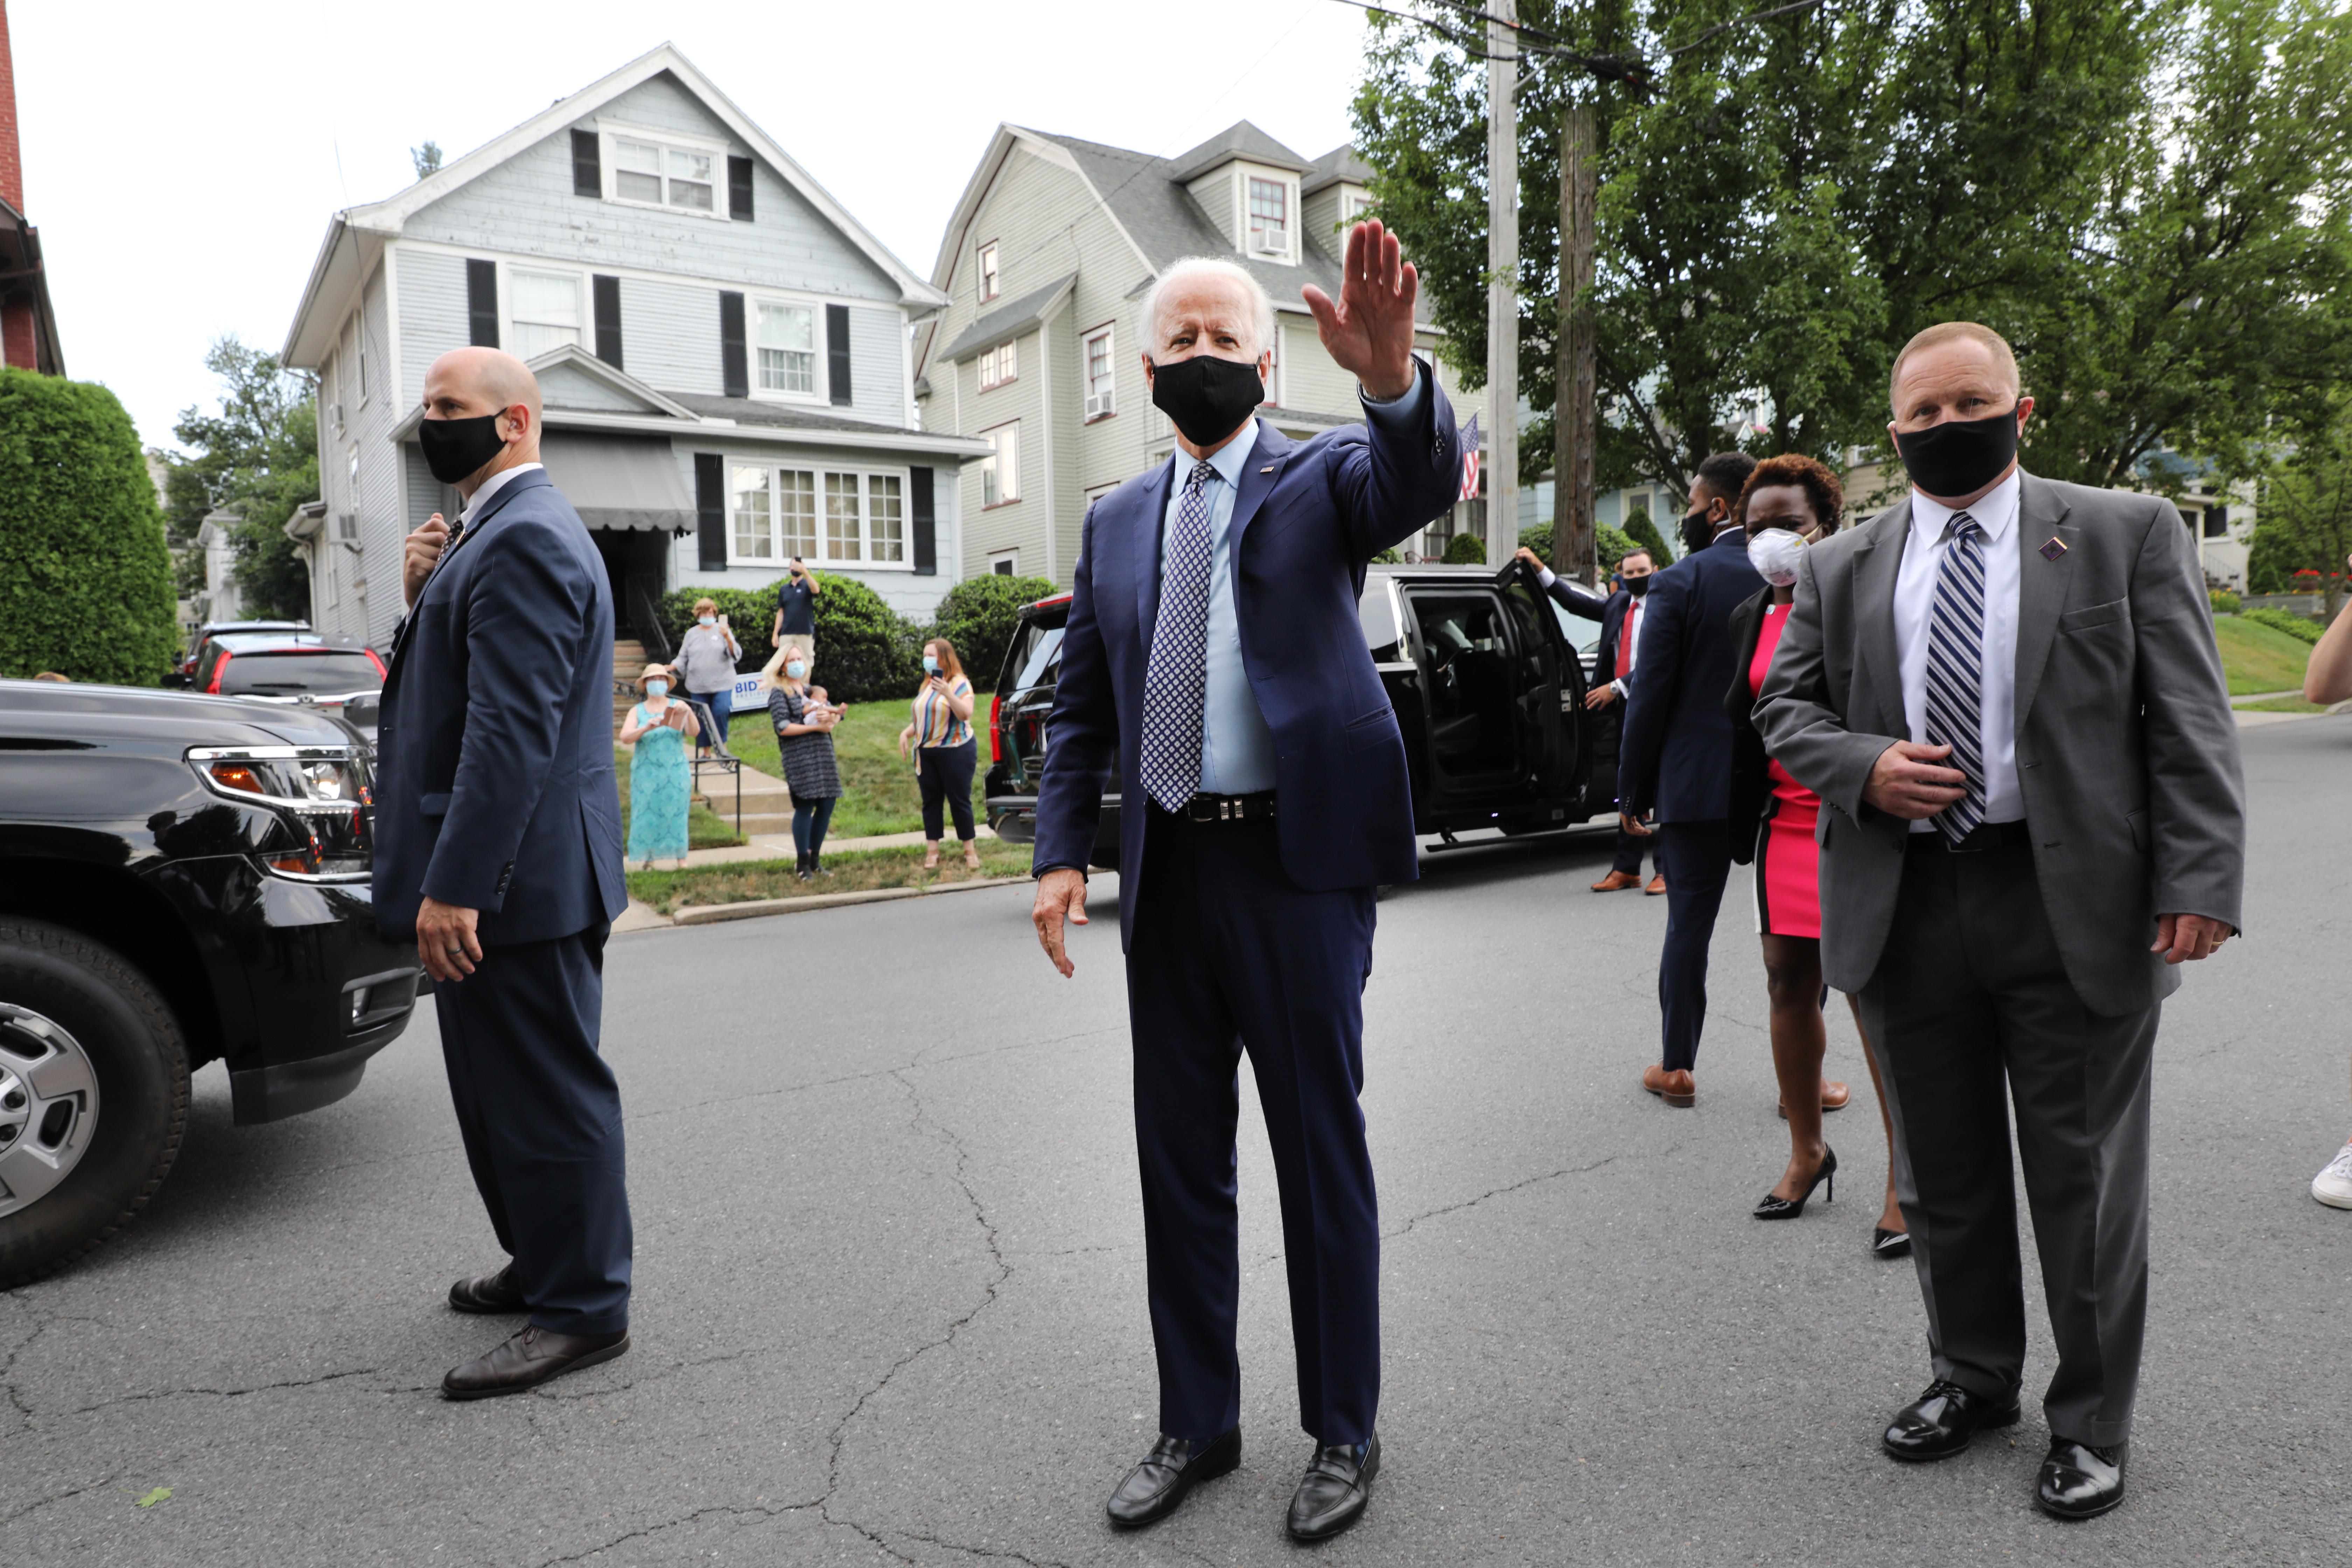 The presumptive Democratic presidential nominee Joe Biden stops in front of his childhood home on July 09, 2020 in Scranton, Pennsylvania.